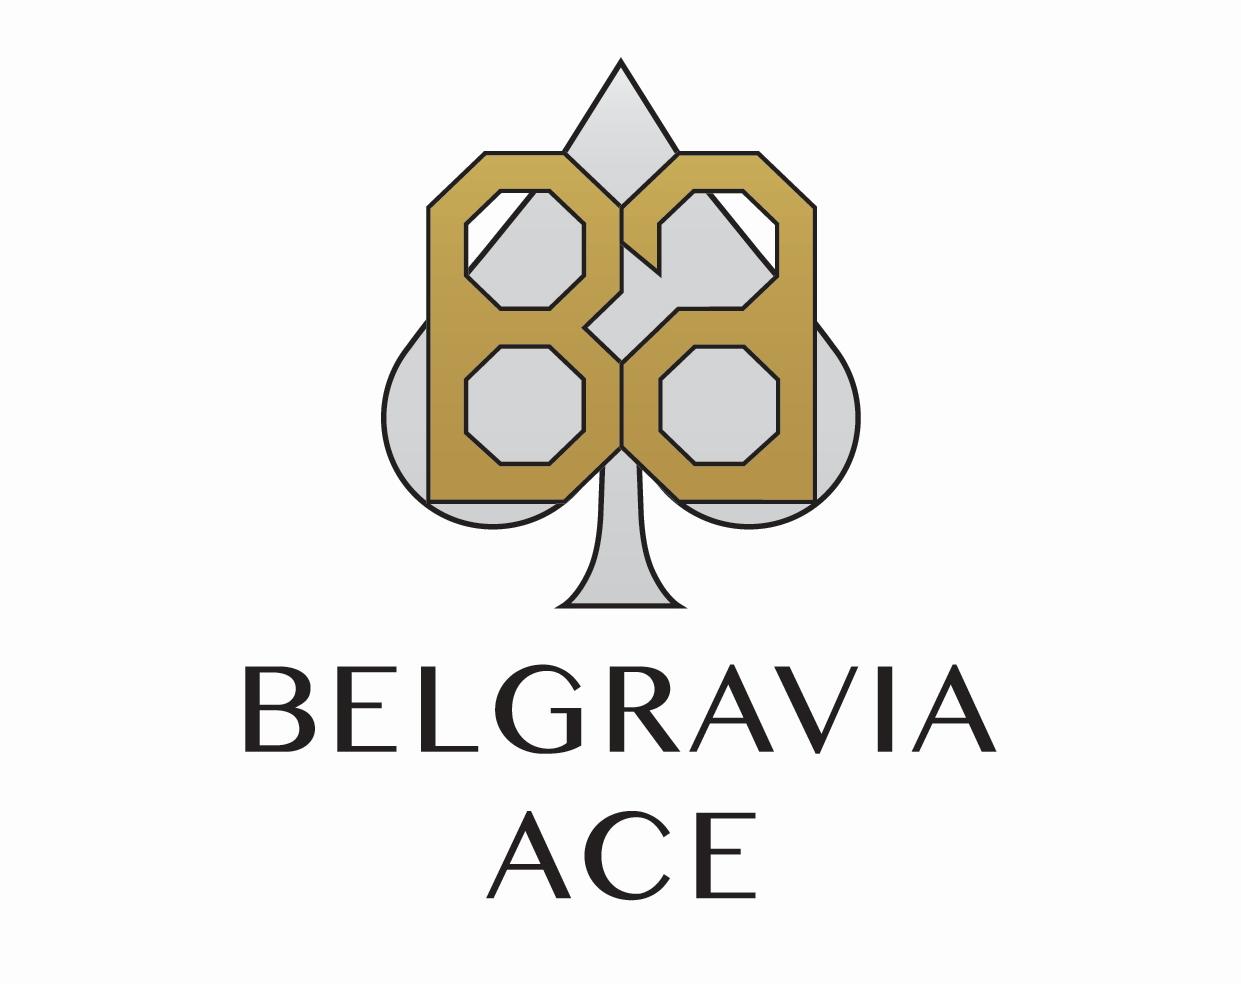 Belgravia Ace image